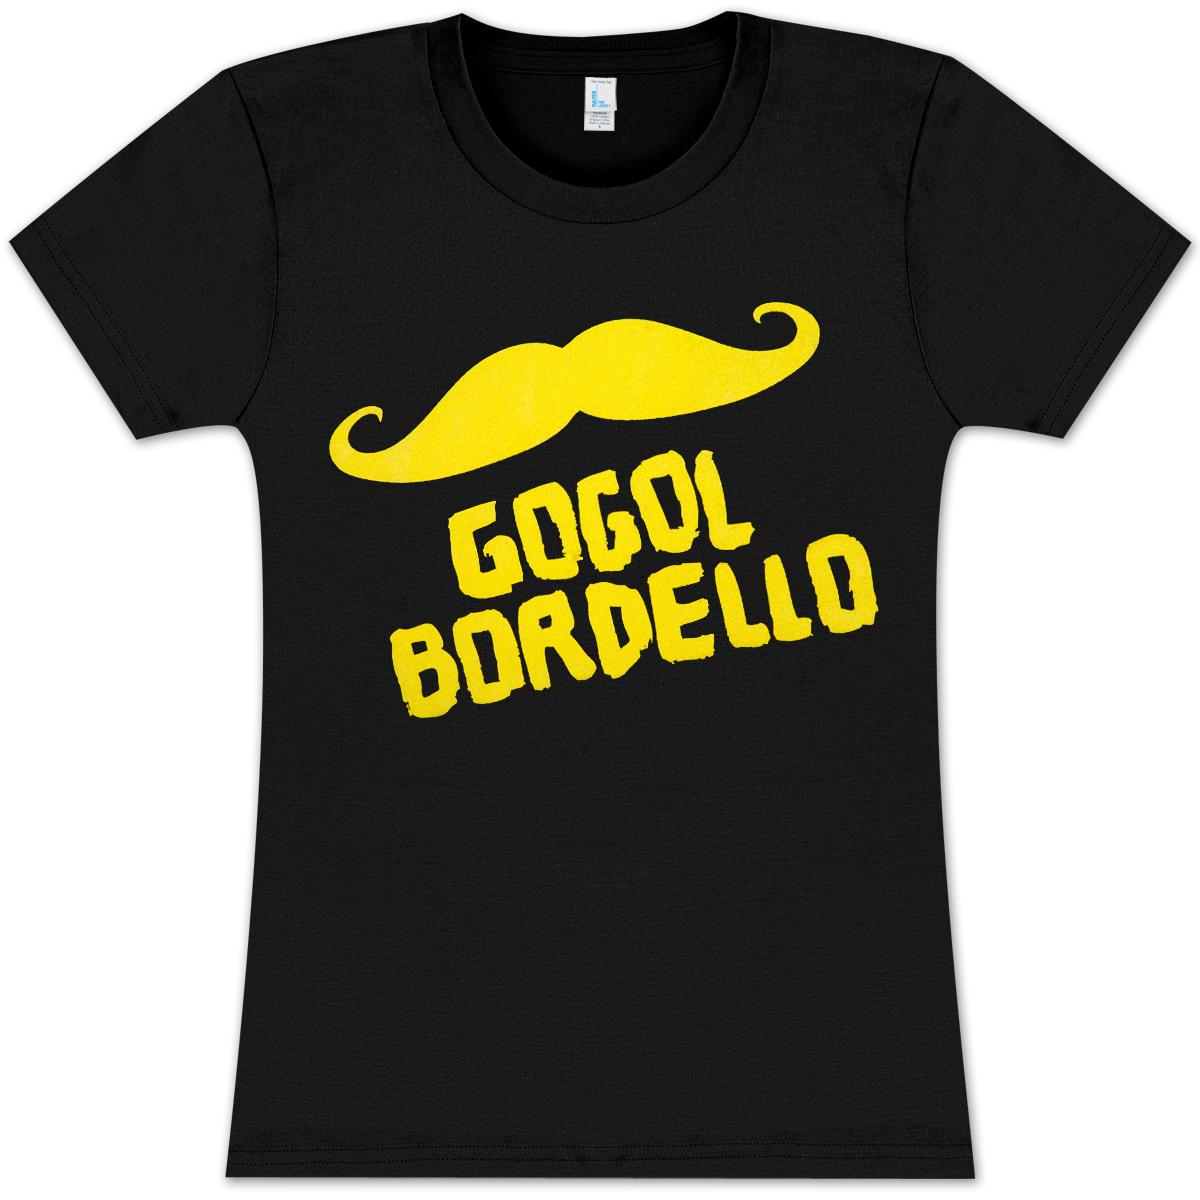 Mustache Crew-Neck T-shirt - Ladies